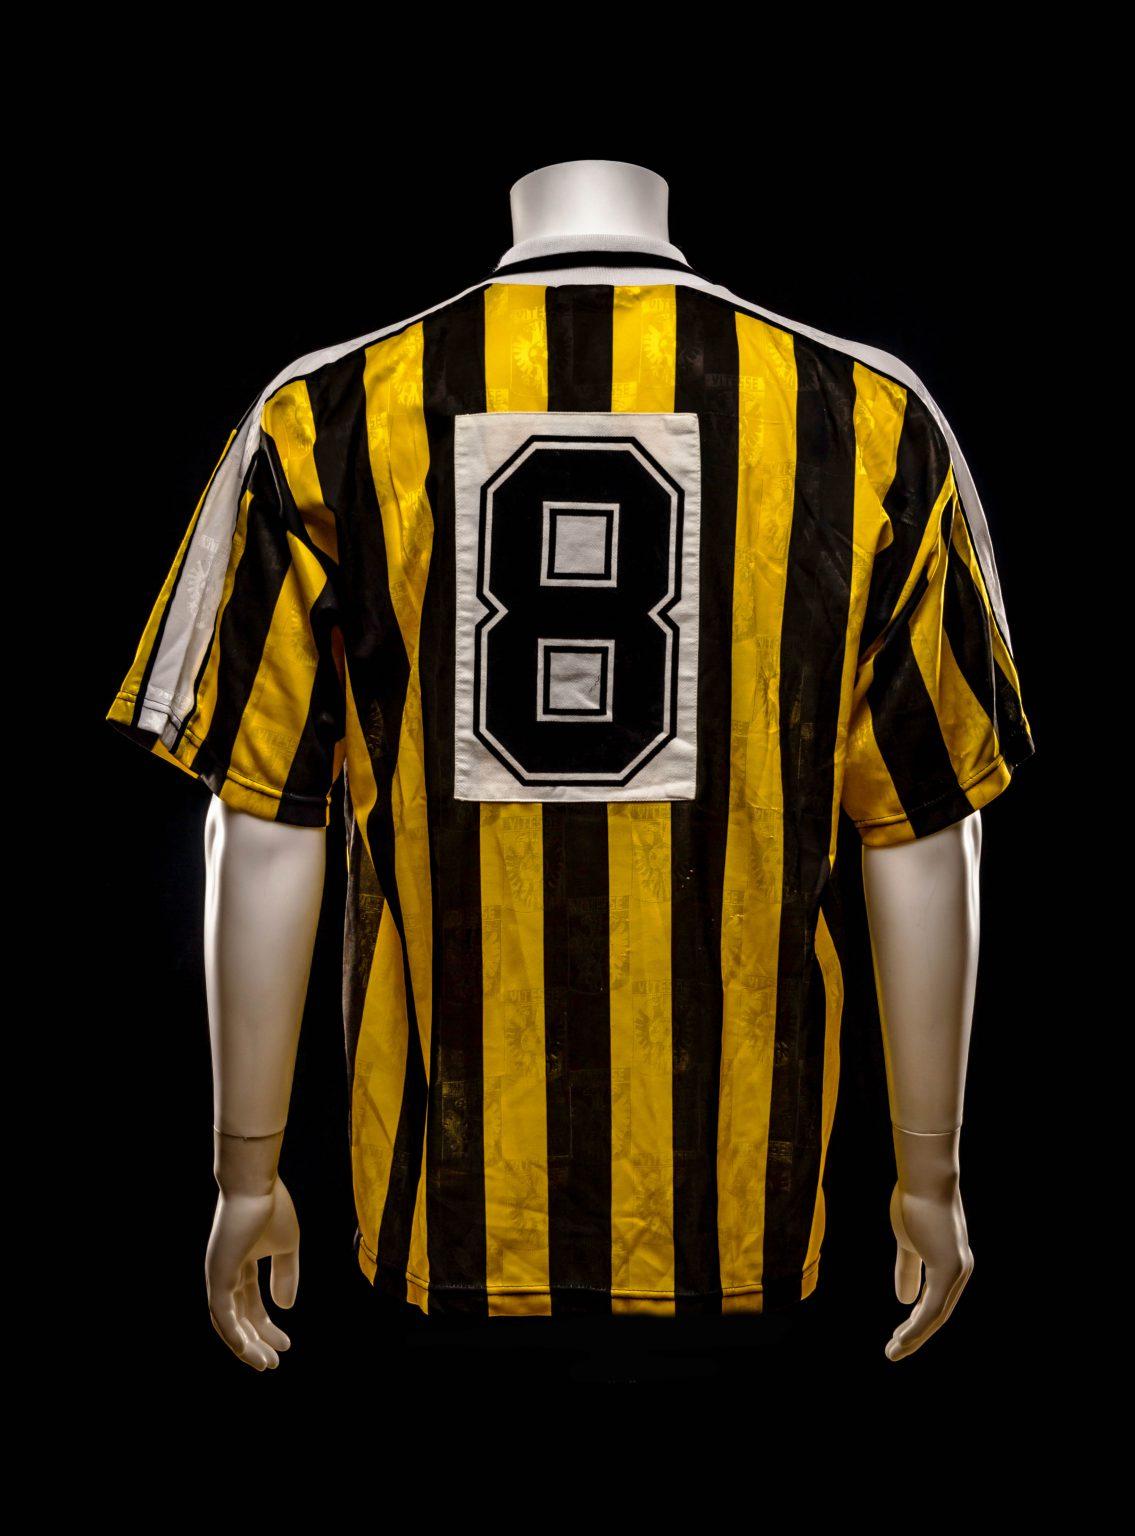 #8 Rene Eijer Vitesse 1990-1991